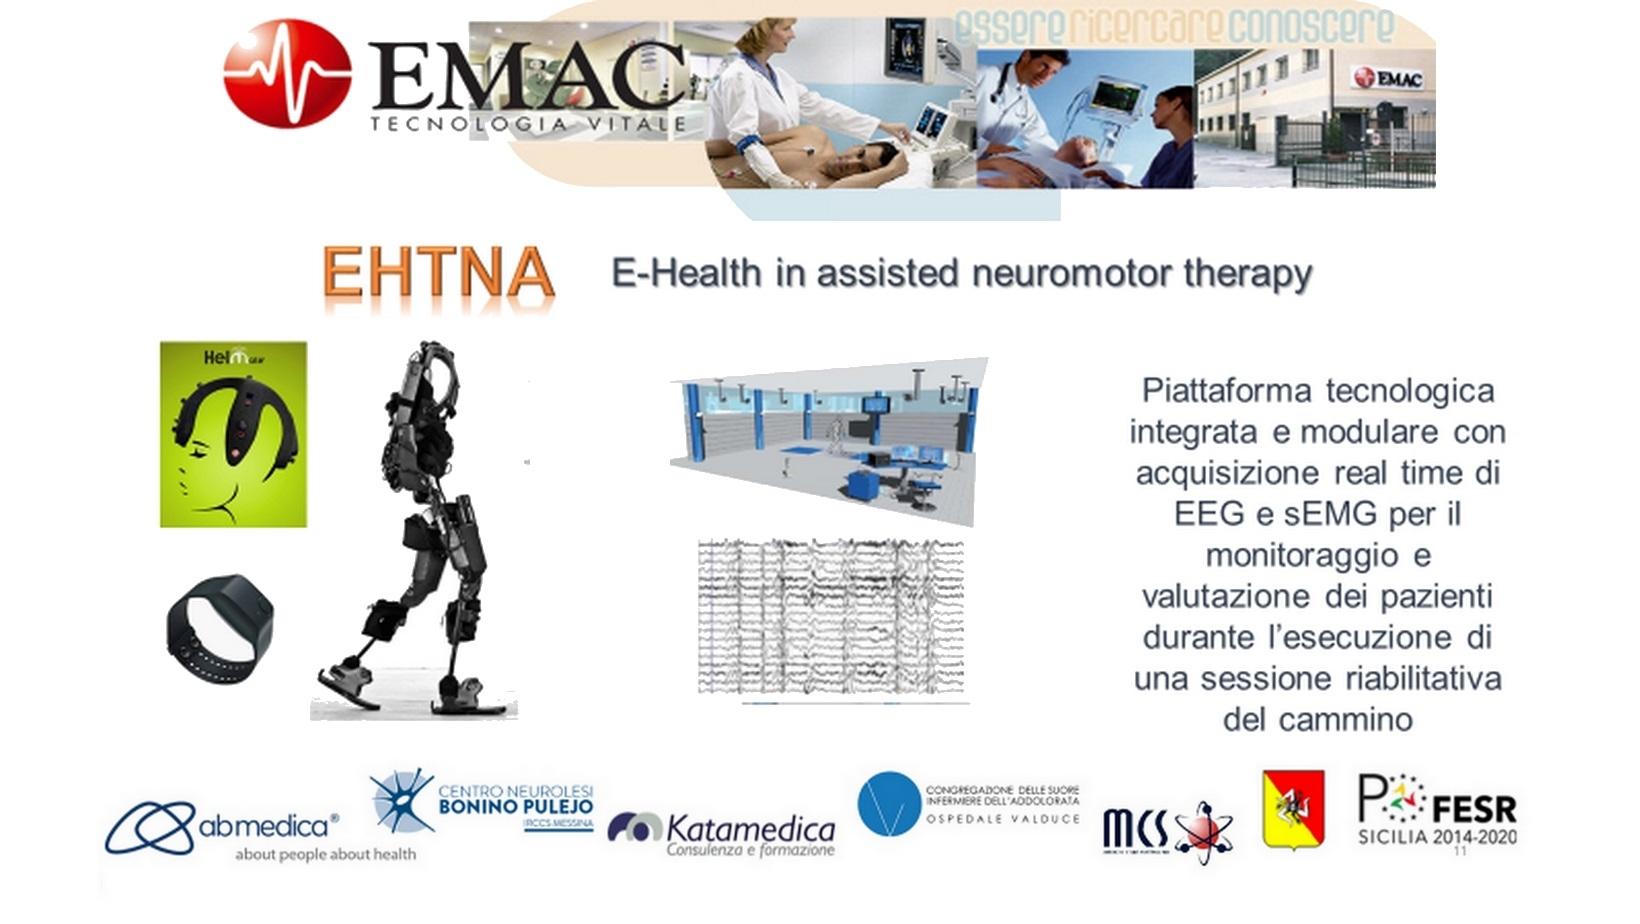 emac progetto ehtna (4)